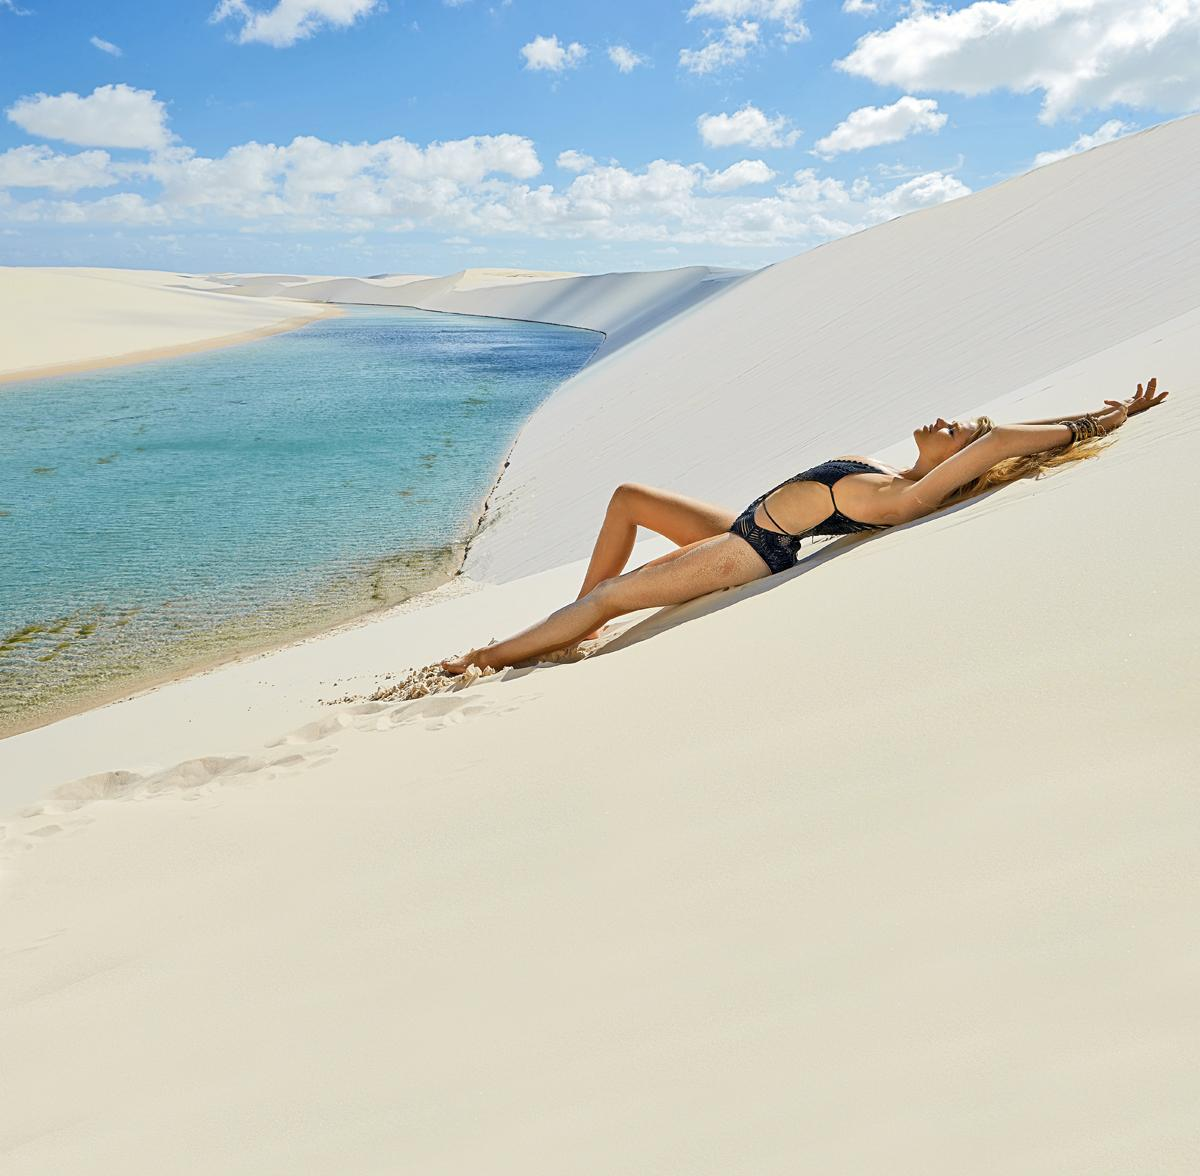 Camille Kostek Outtakes: Valerie Van Der Graaf SI Swimsuit 2014 Outtakes In Brazil